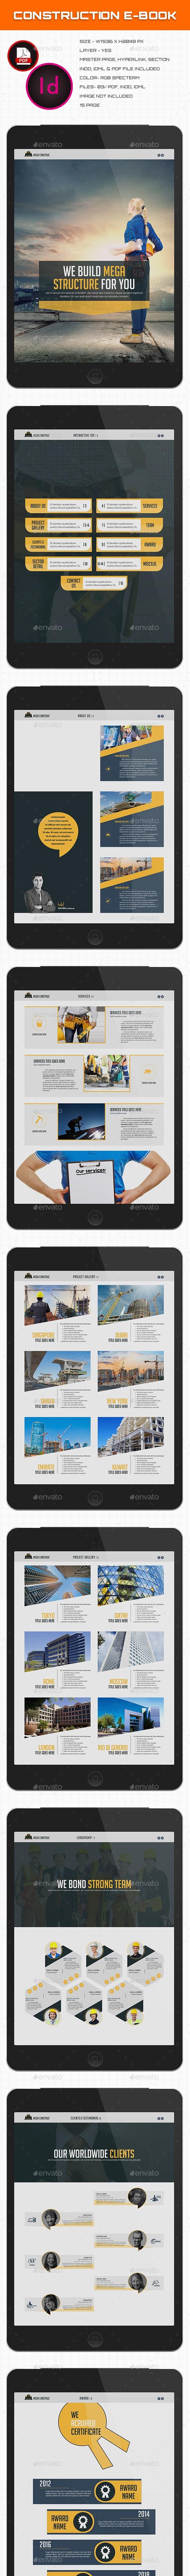 Construction E-book - Digital Books ePublishing